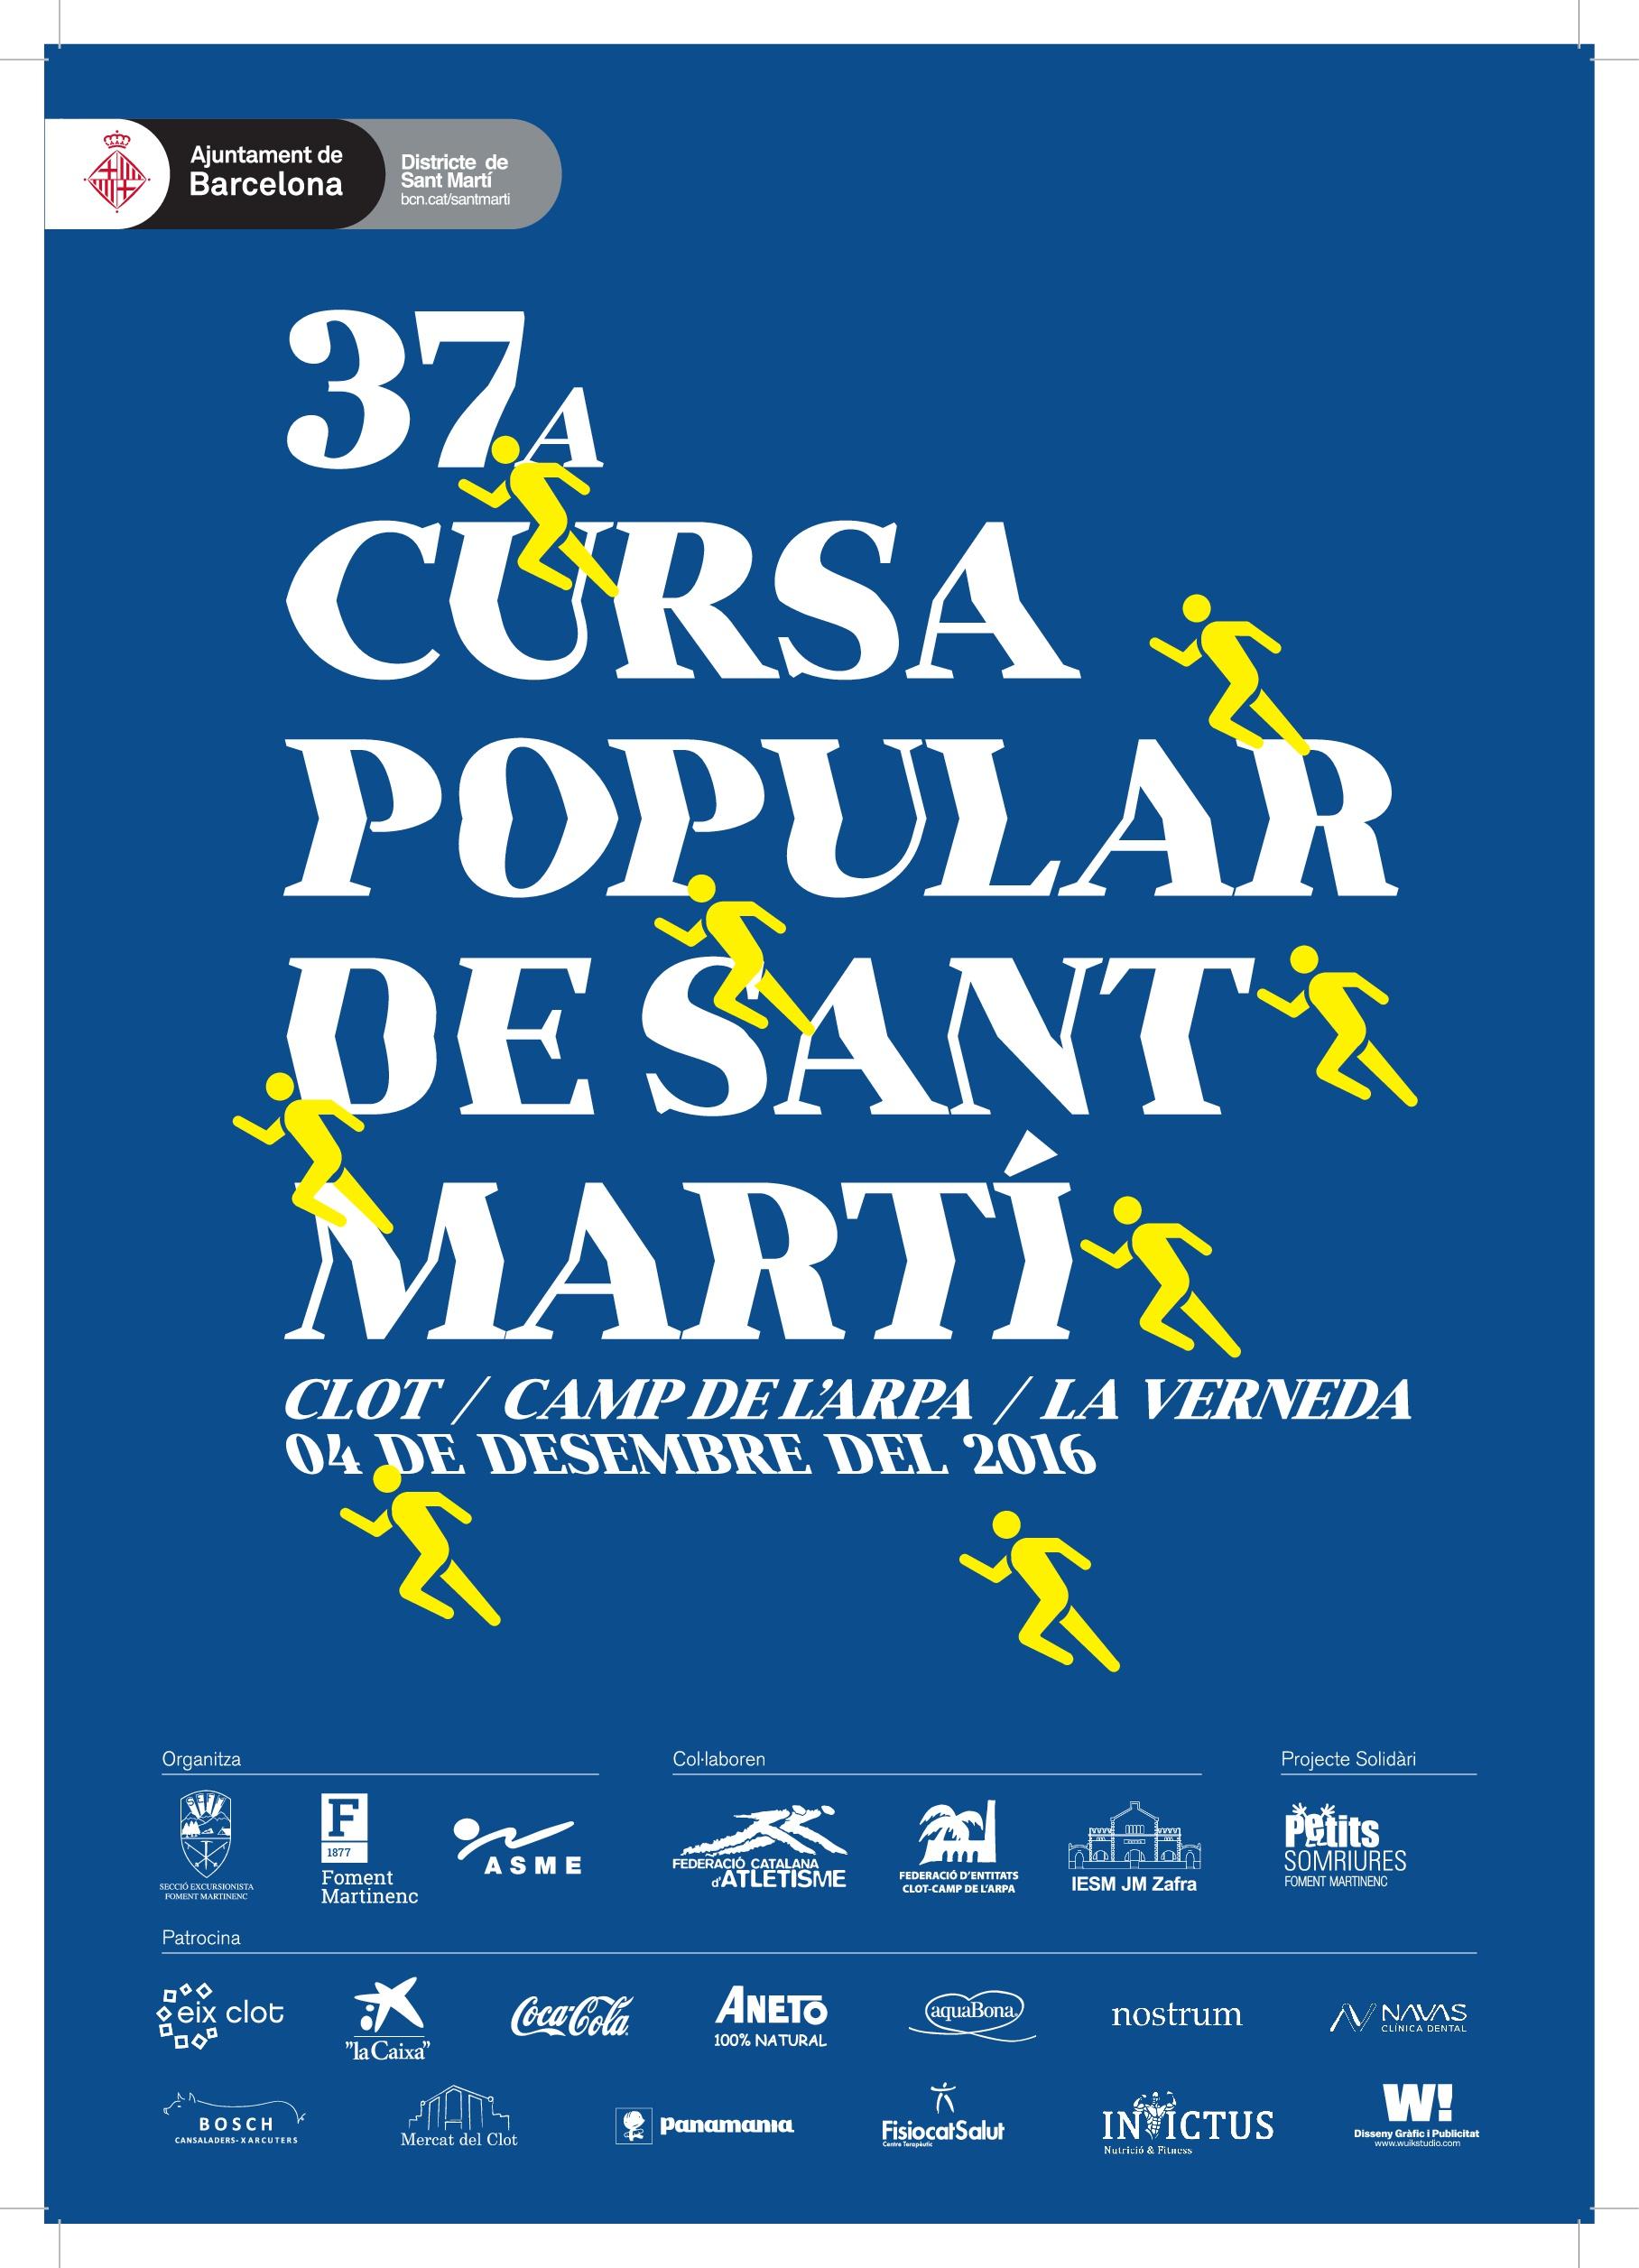 20161204_cursa_cartell